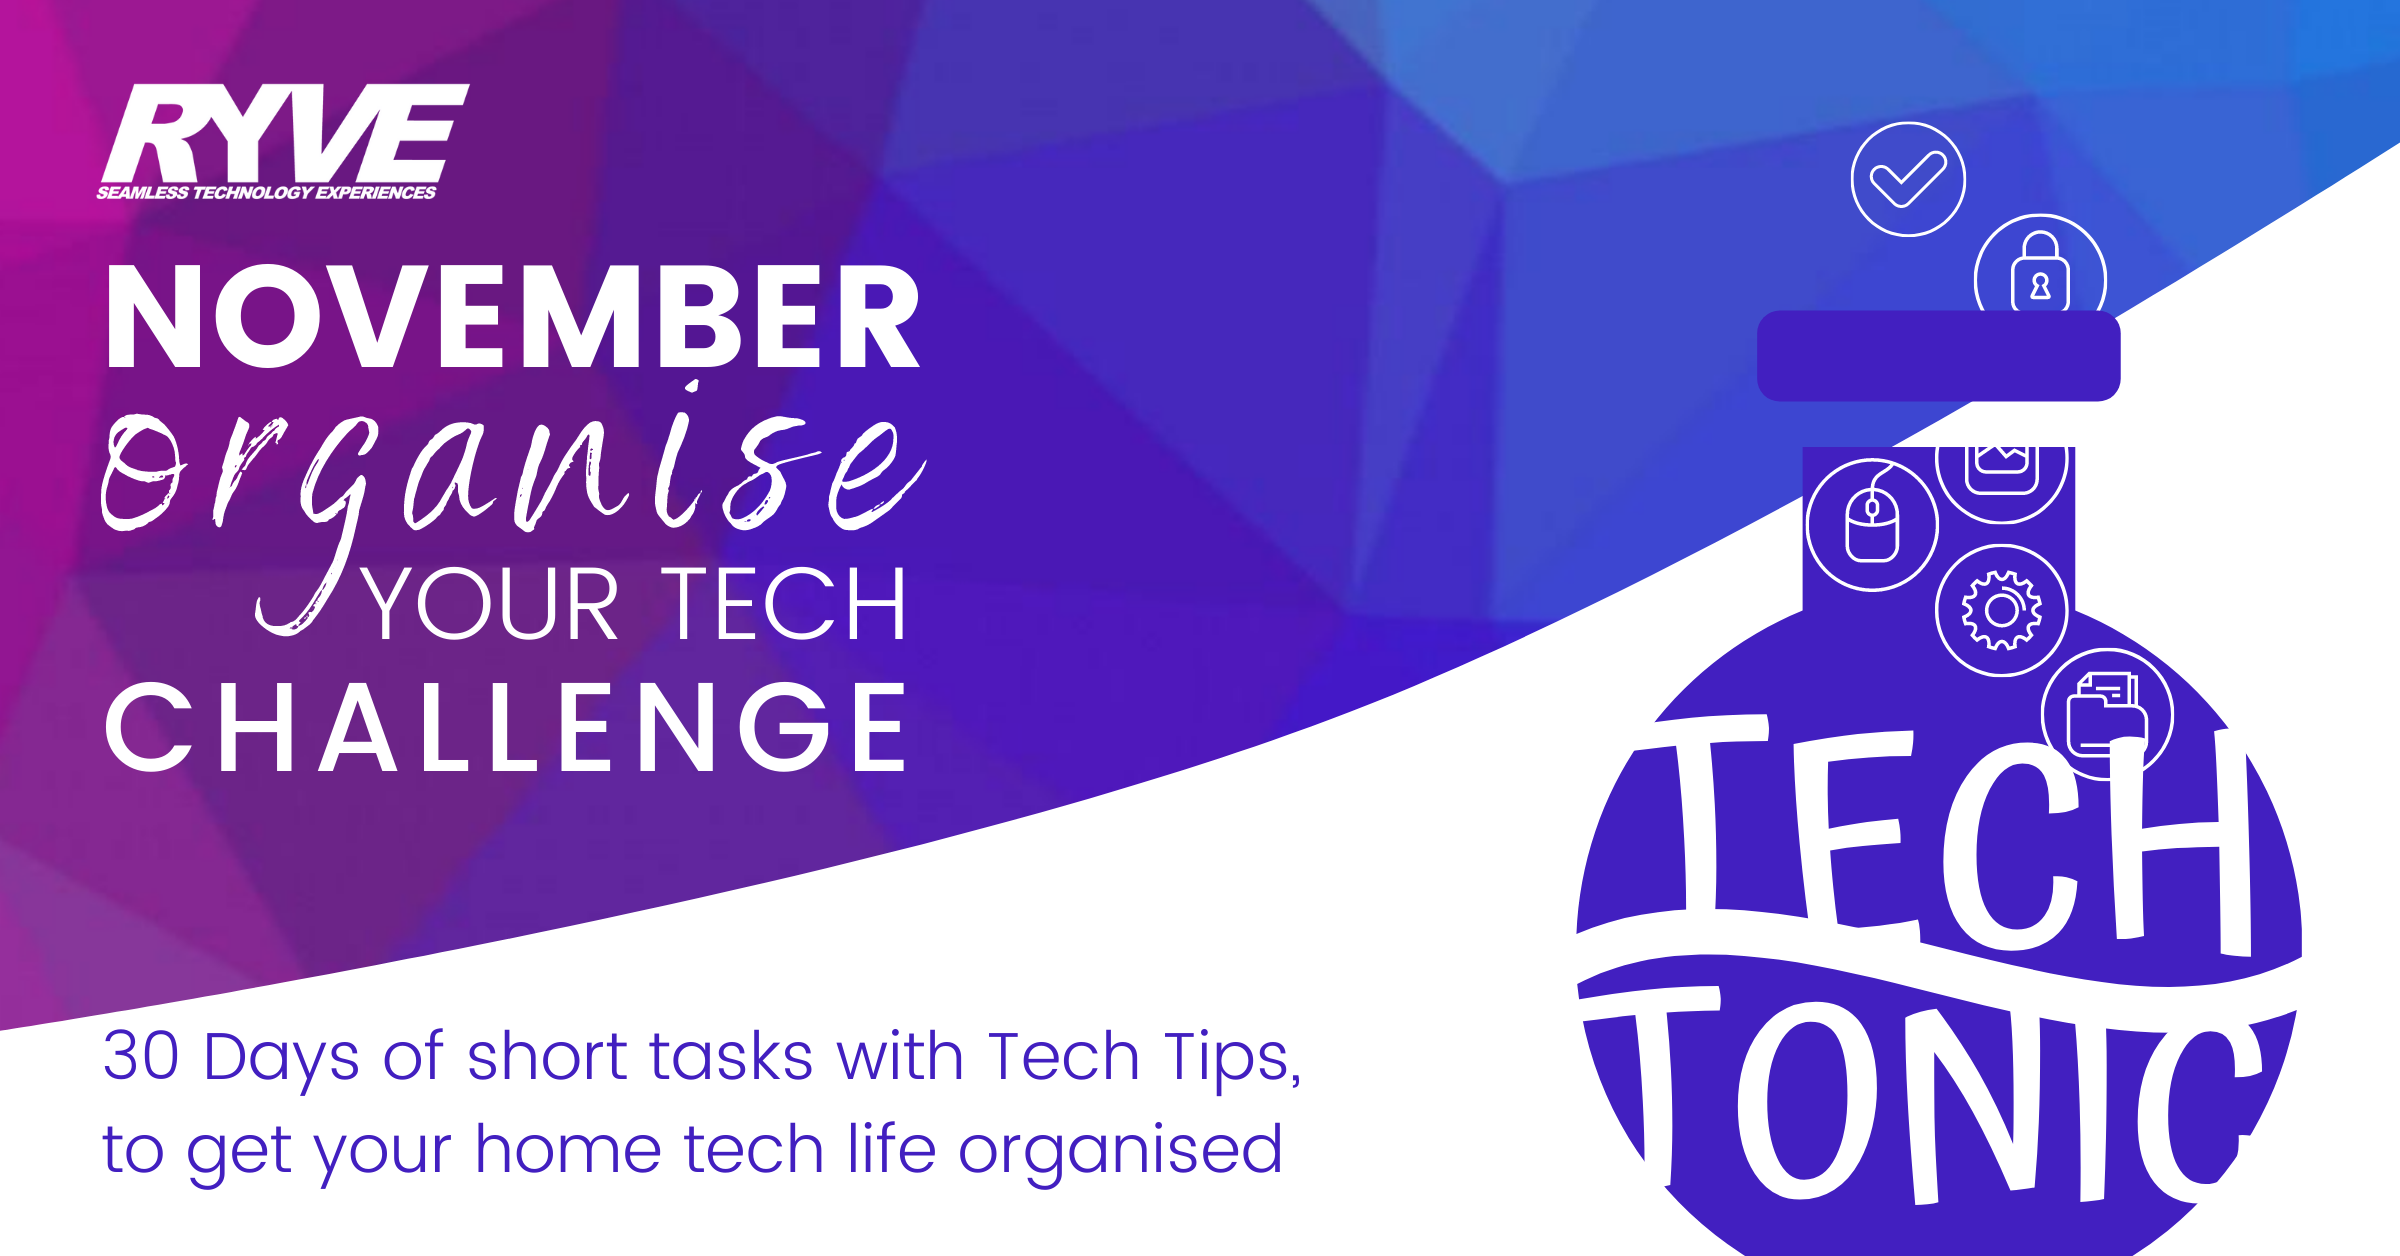 Ryve Tech Challenge November 2020